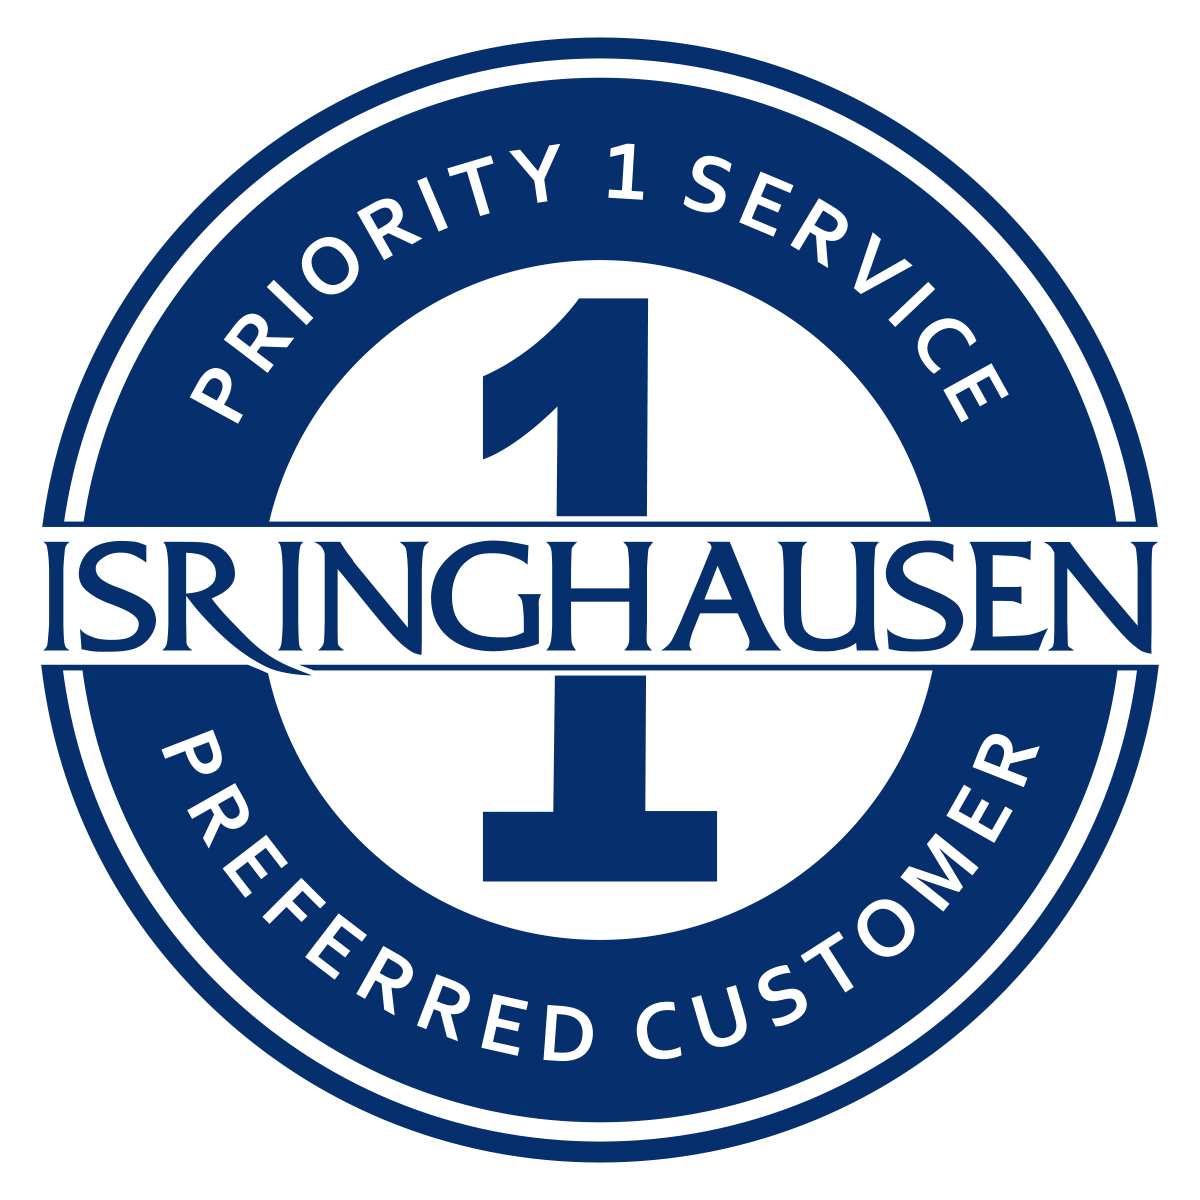 Priority One Service